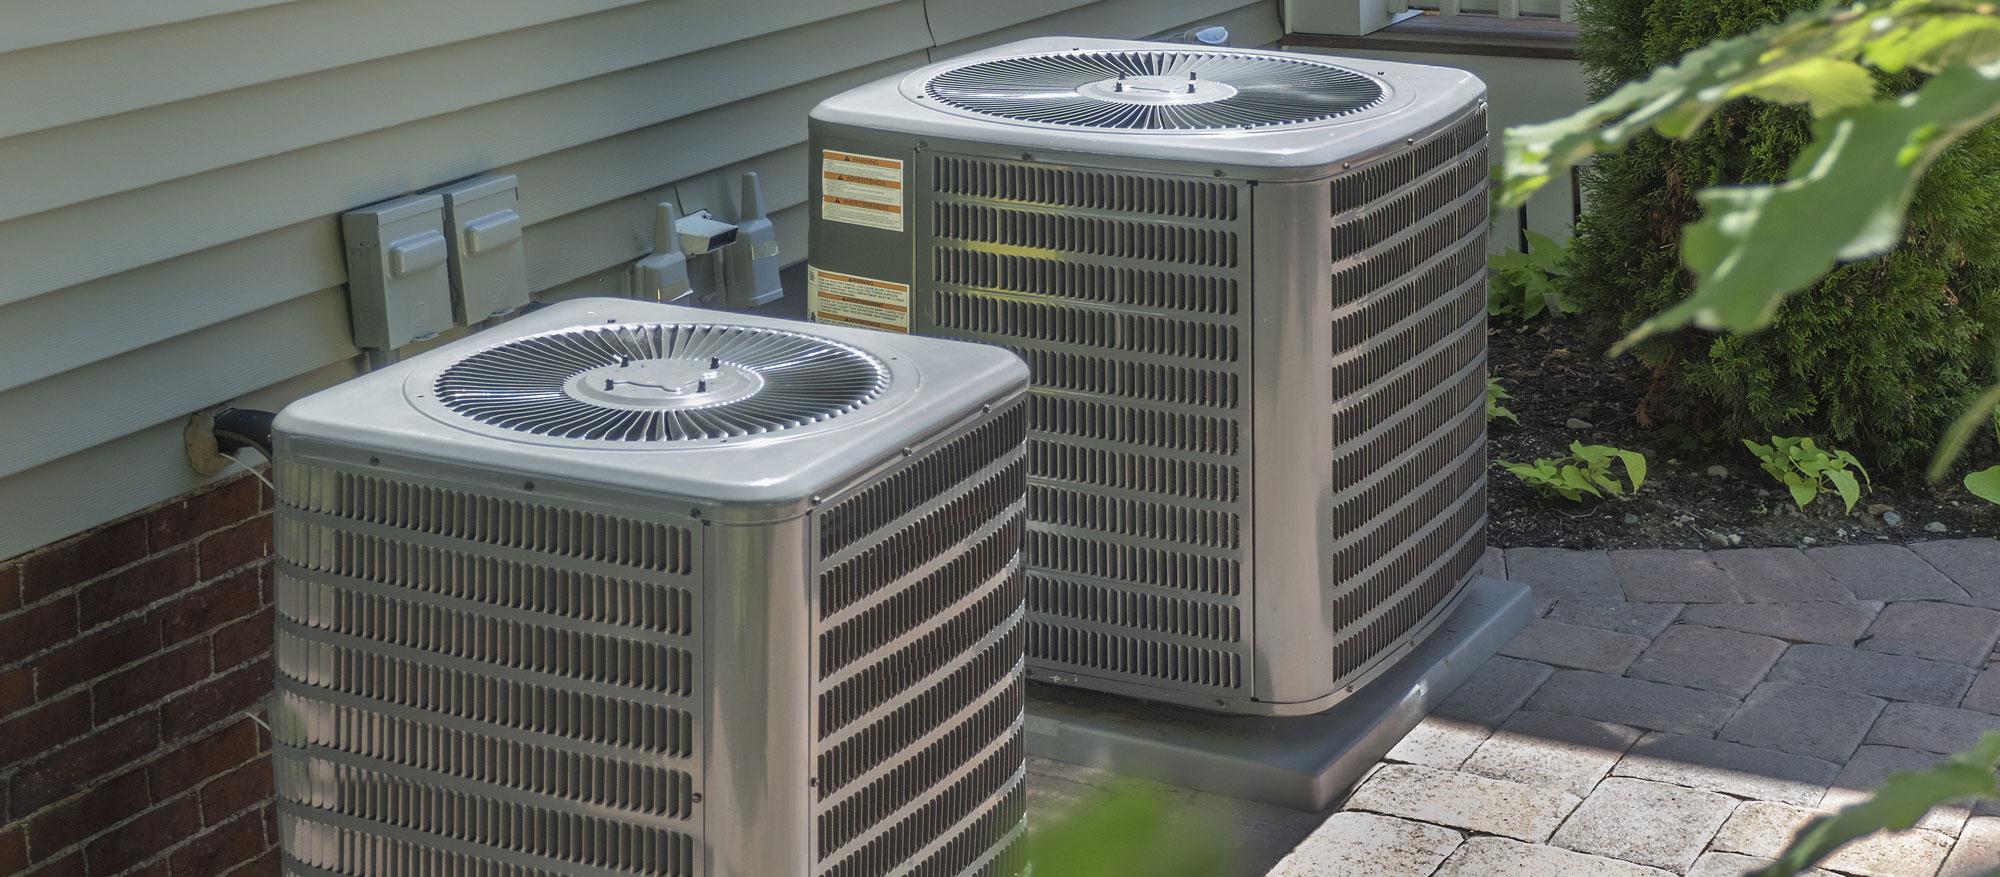 Hvac Contractor Heating Ac Install Repair Milledgeville Eatonton Macon Ga